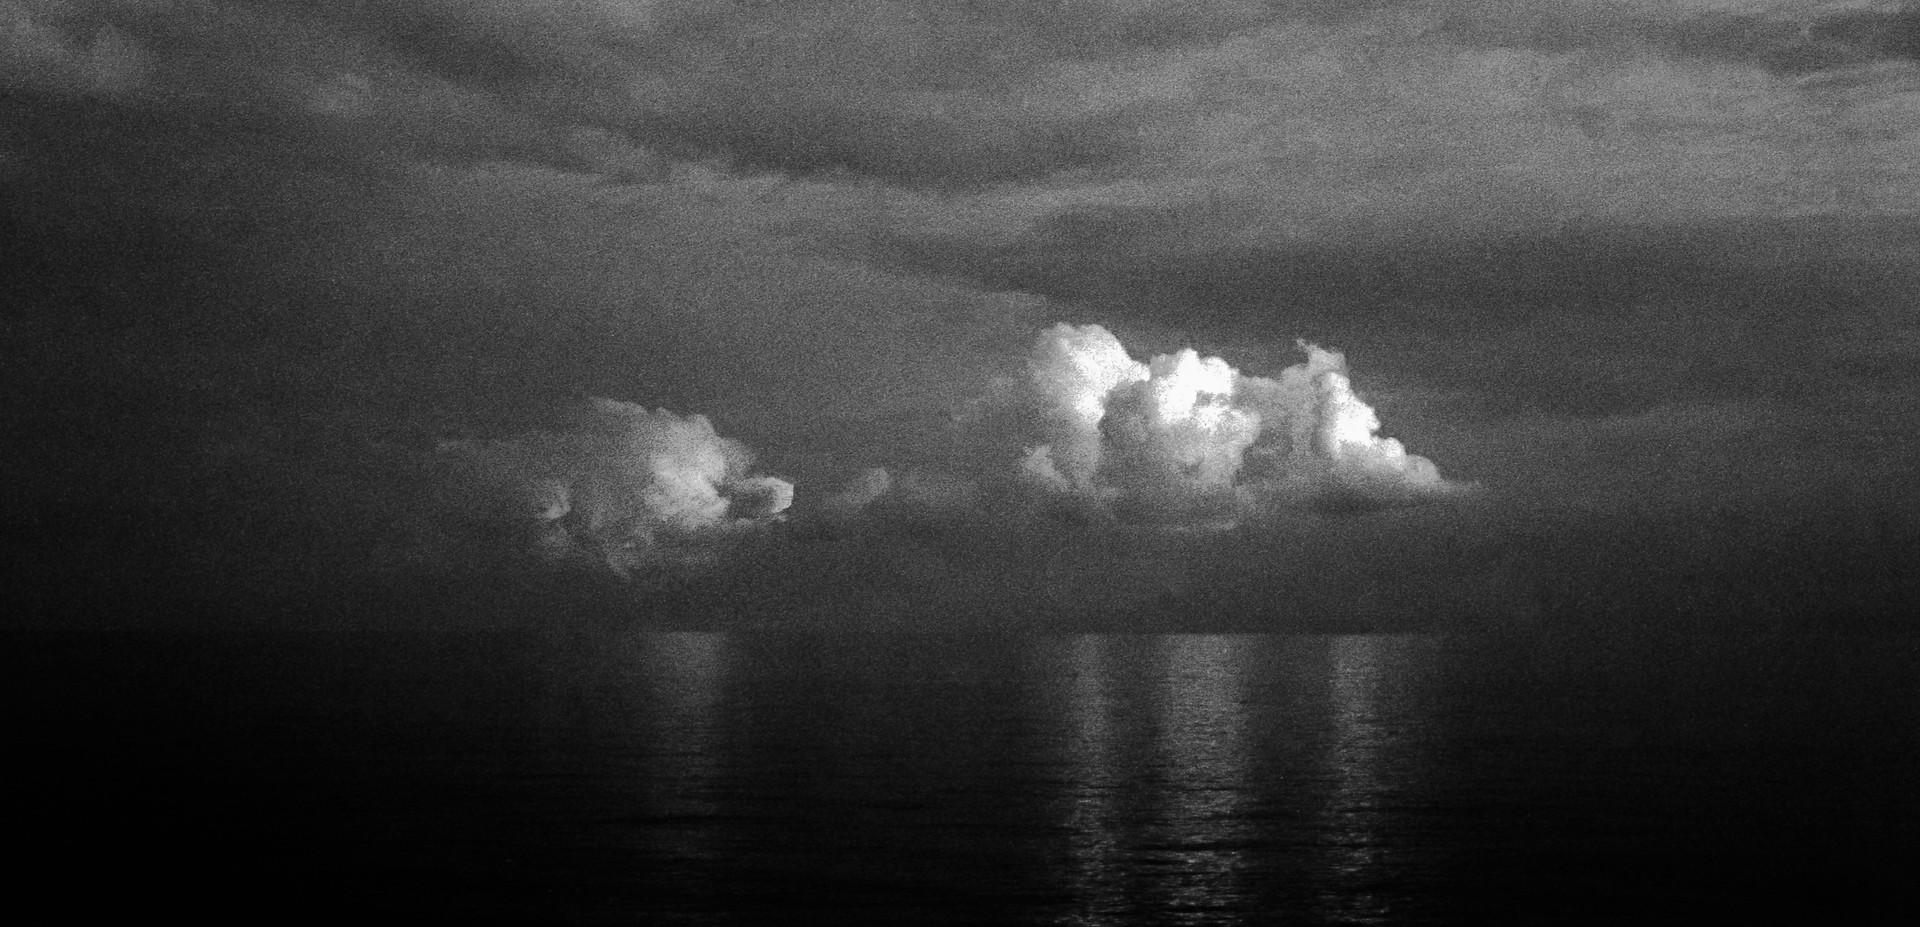 Clouds_Hastings, England 1985